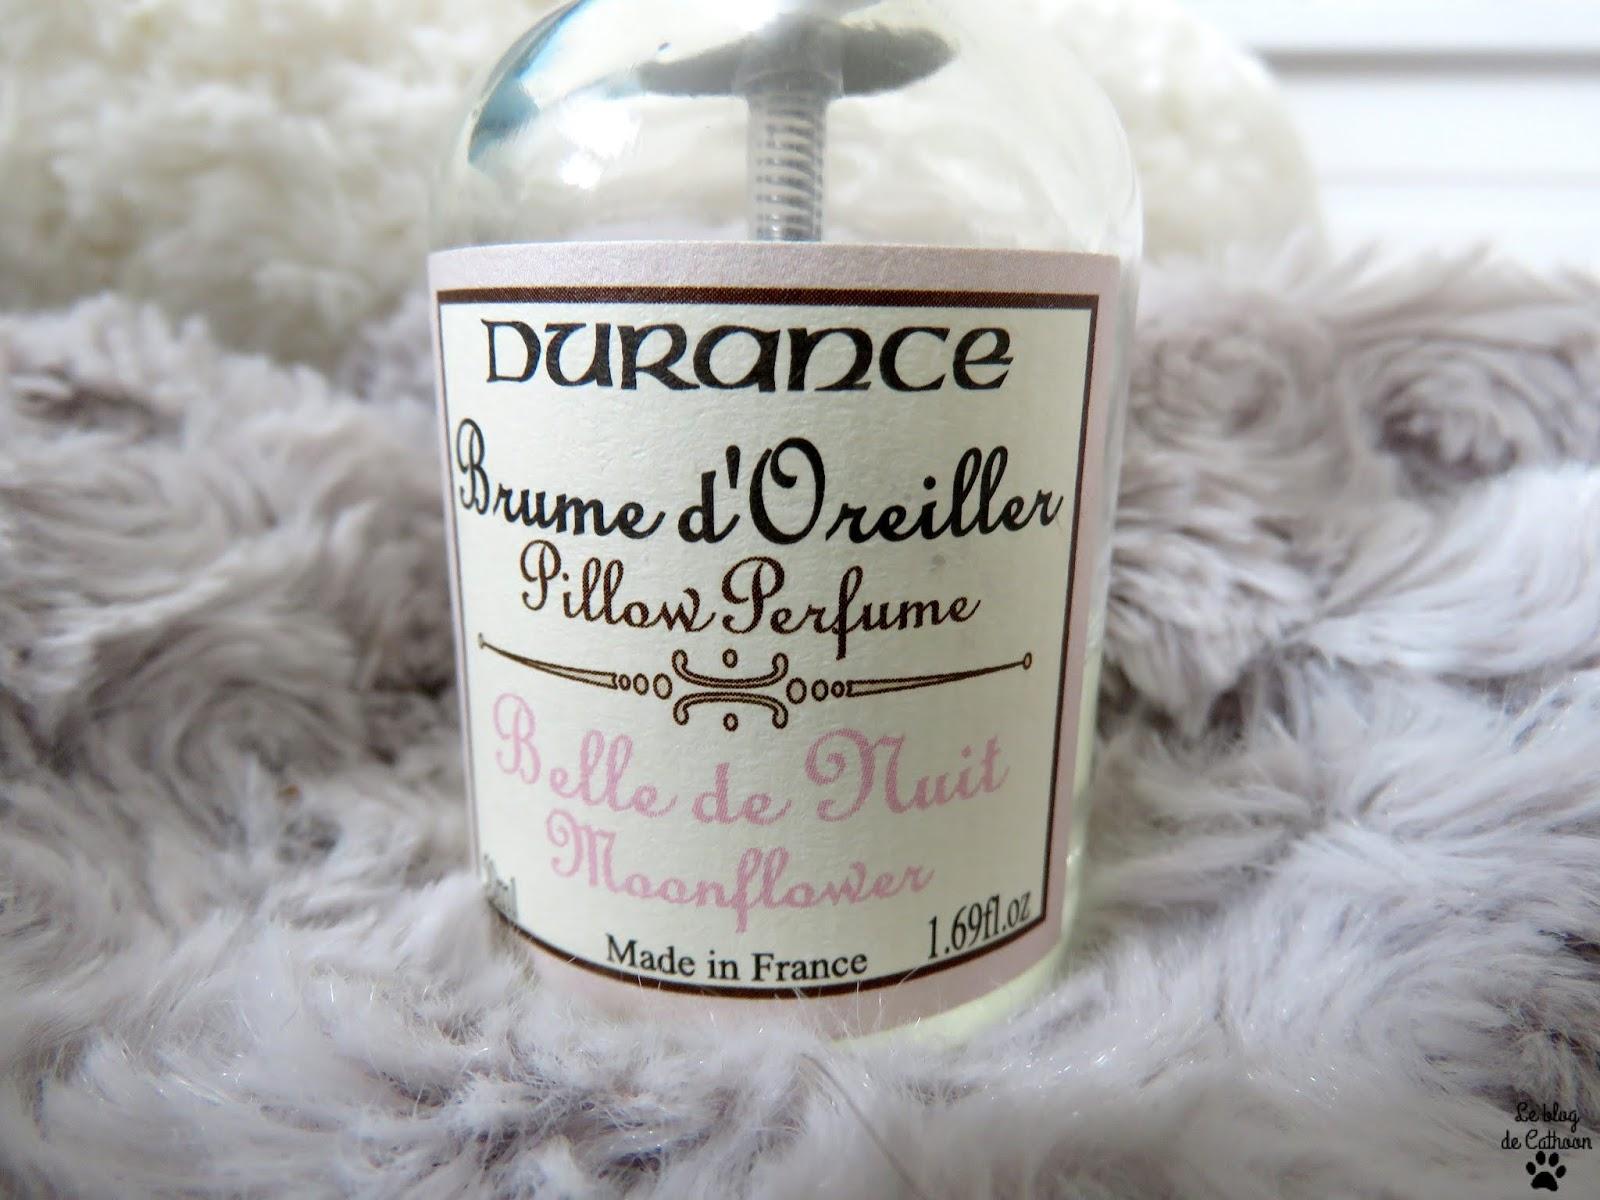 Brume d'Oreiller - Belle de Nuit - Durance